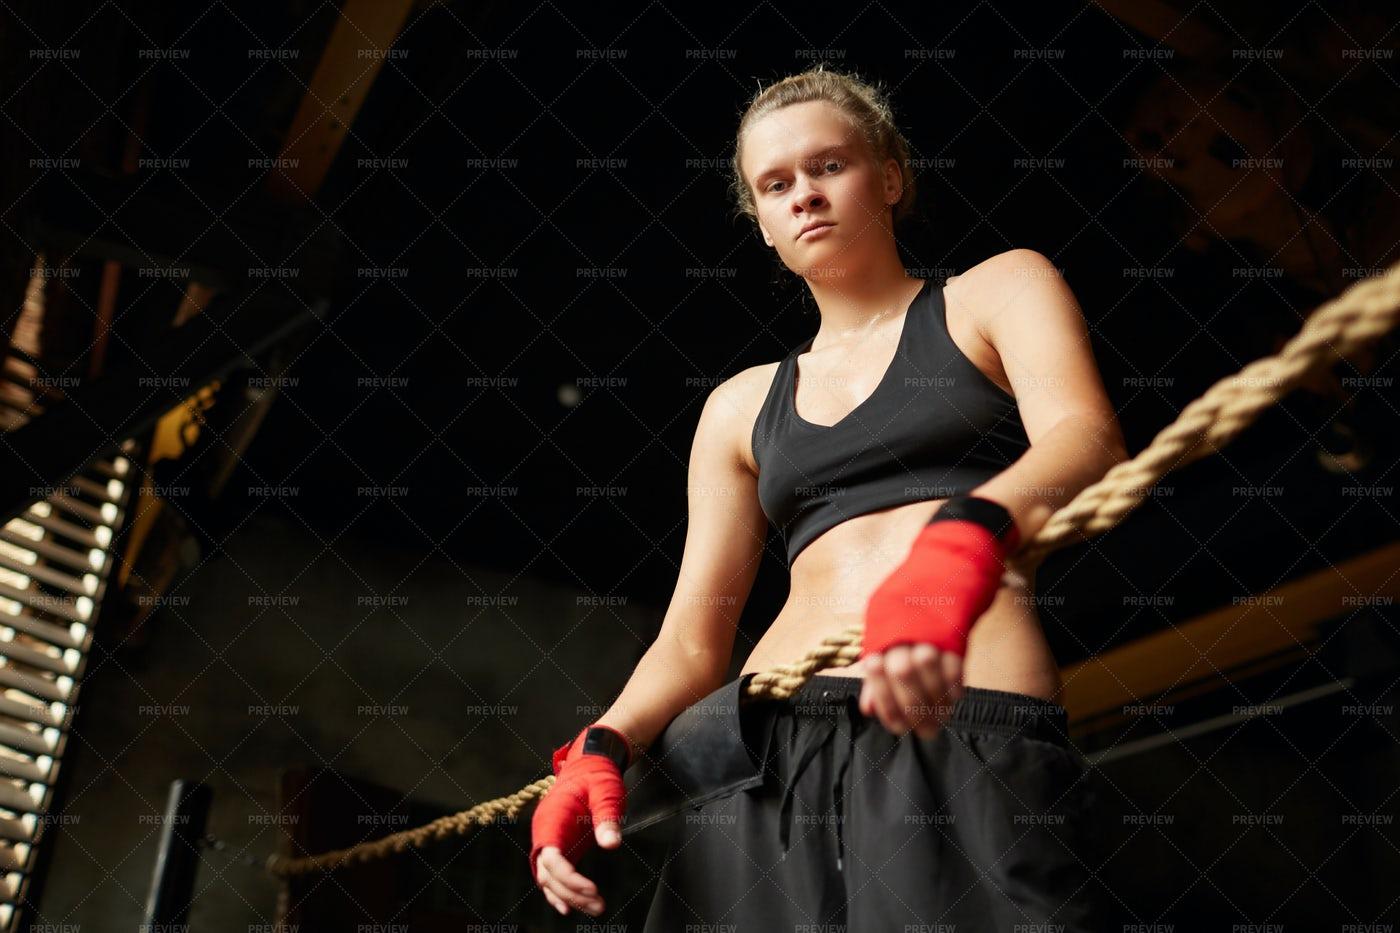 Tough Female Boxer Looking At...: Stock Photos